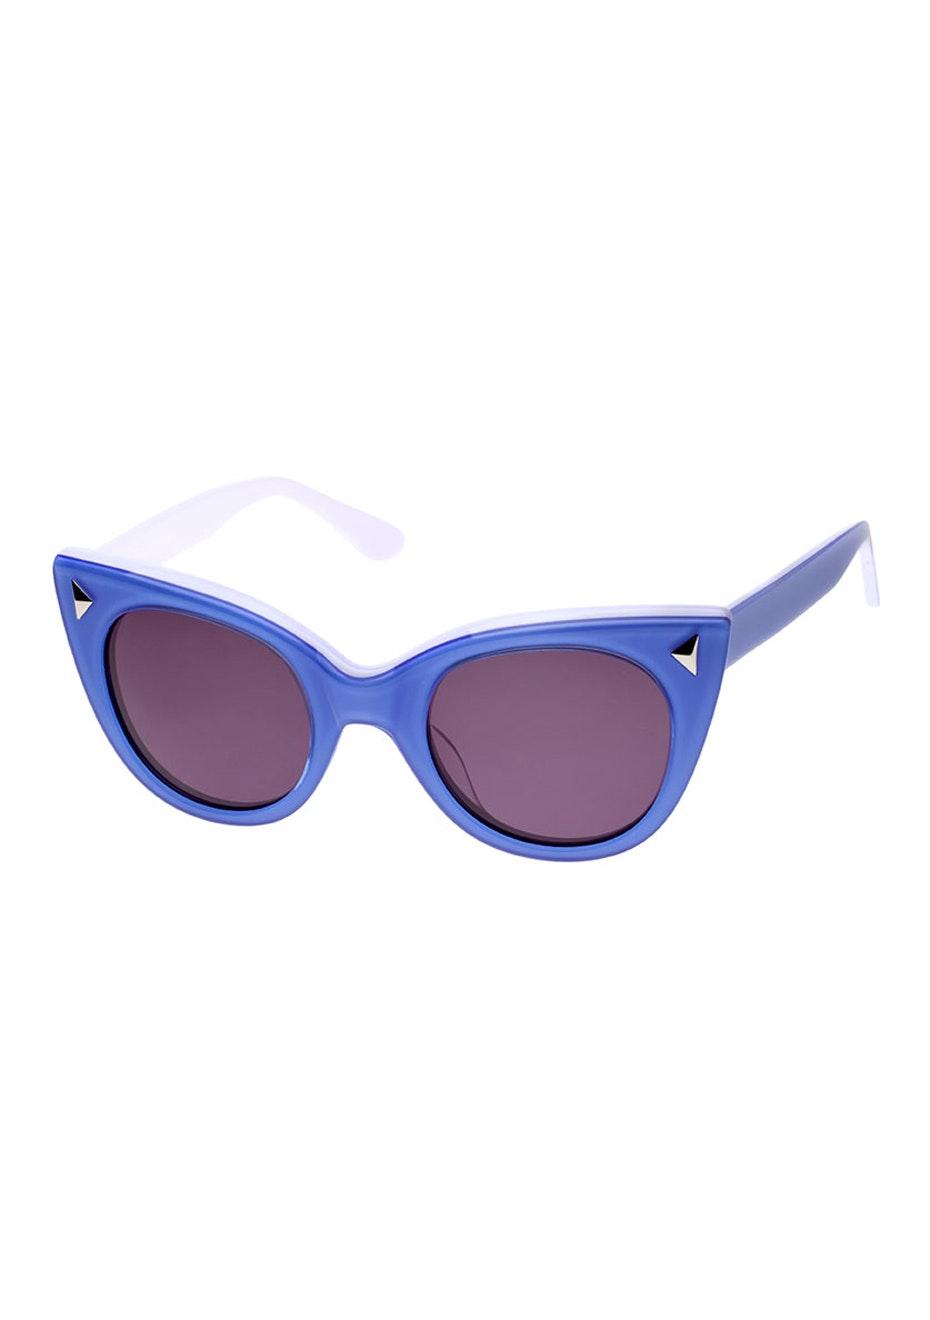 Sass & Bide - Miss Blue Choo 1509743 - Lilac